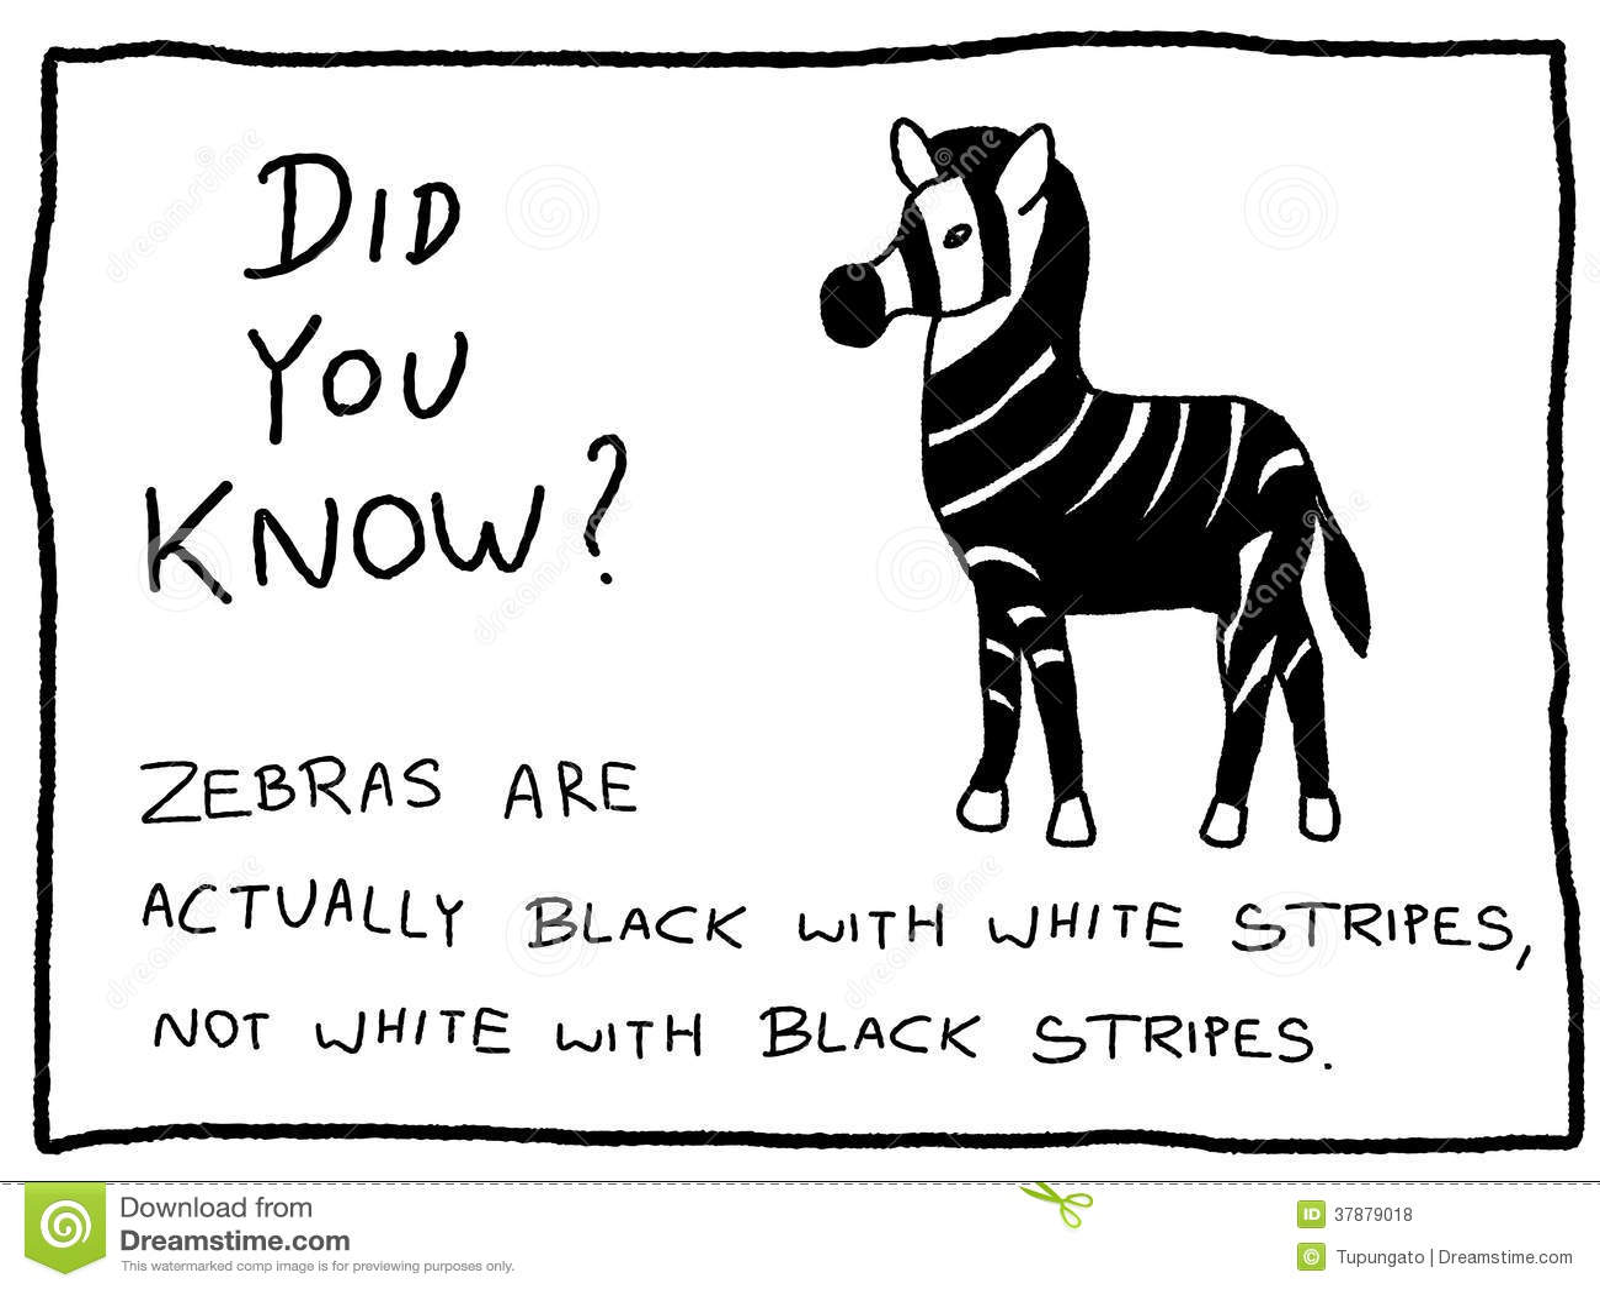 Animal trivia questions